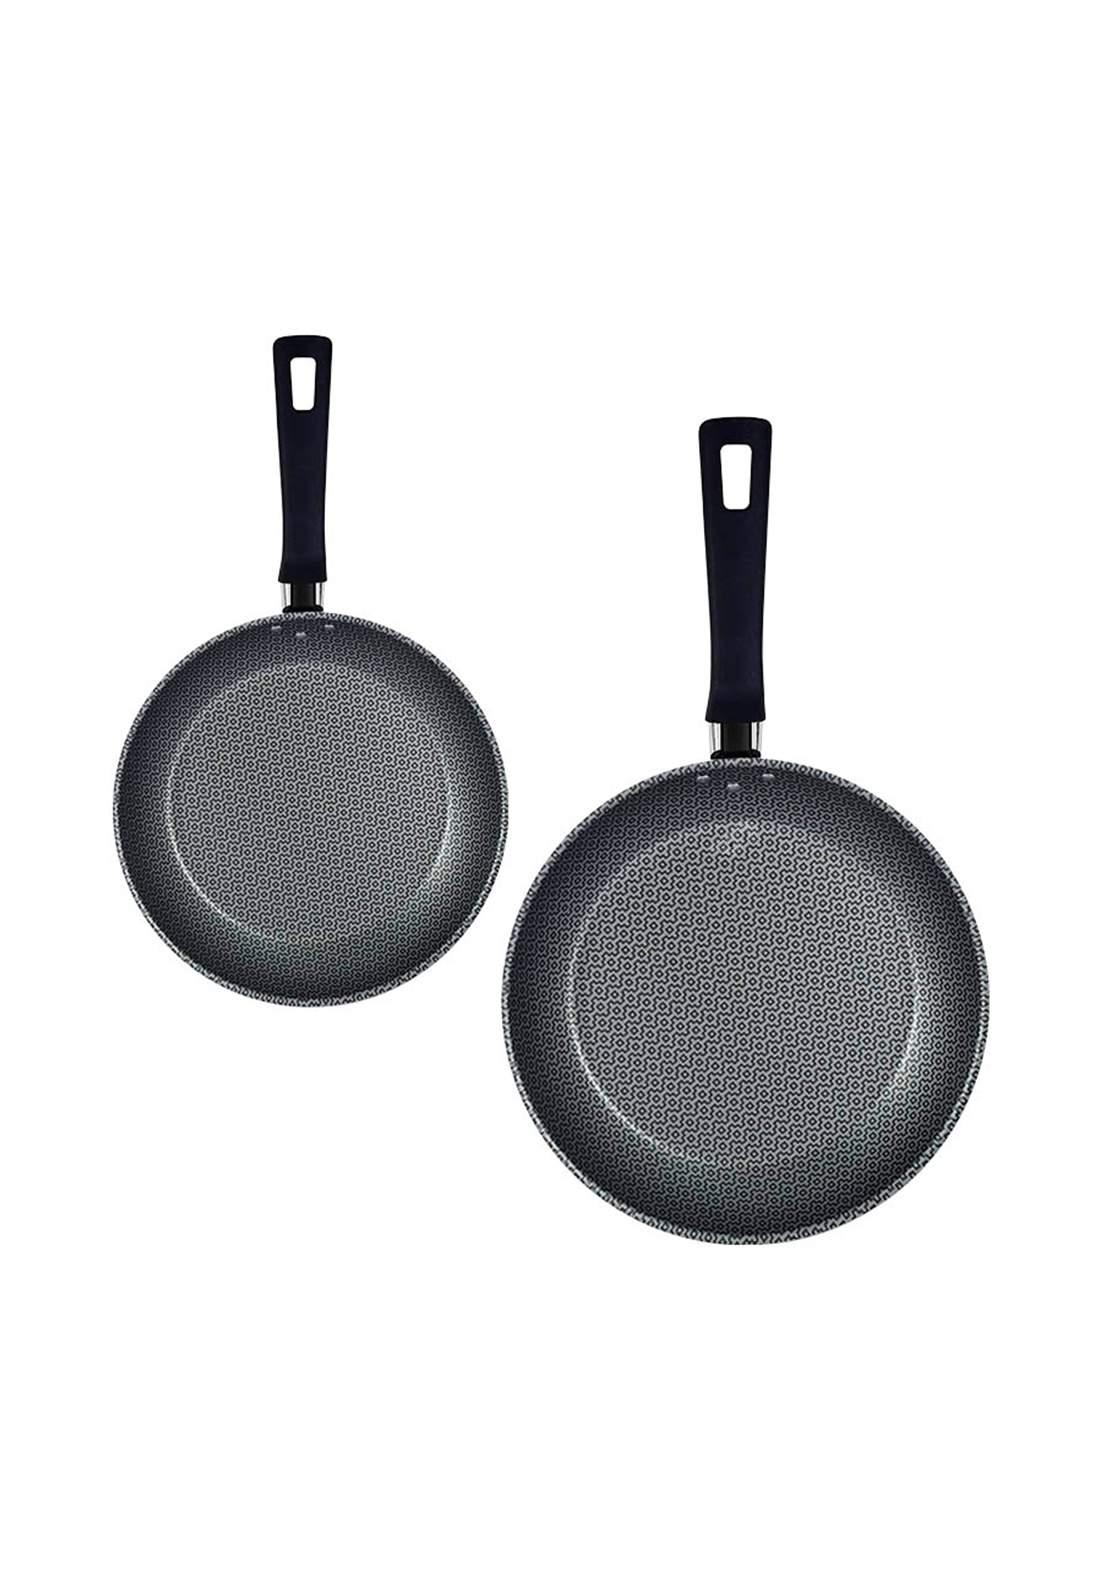 Tramontina '20399-780 Frying Pan Set 20 cm , 24 cm Red سيت قلايات